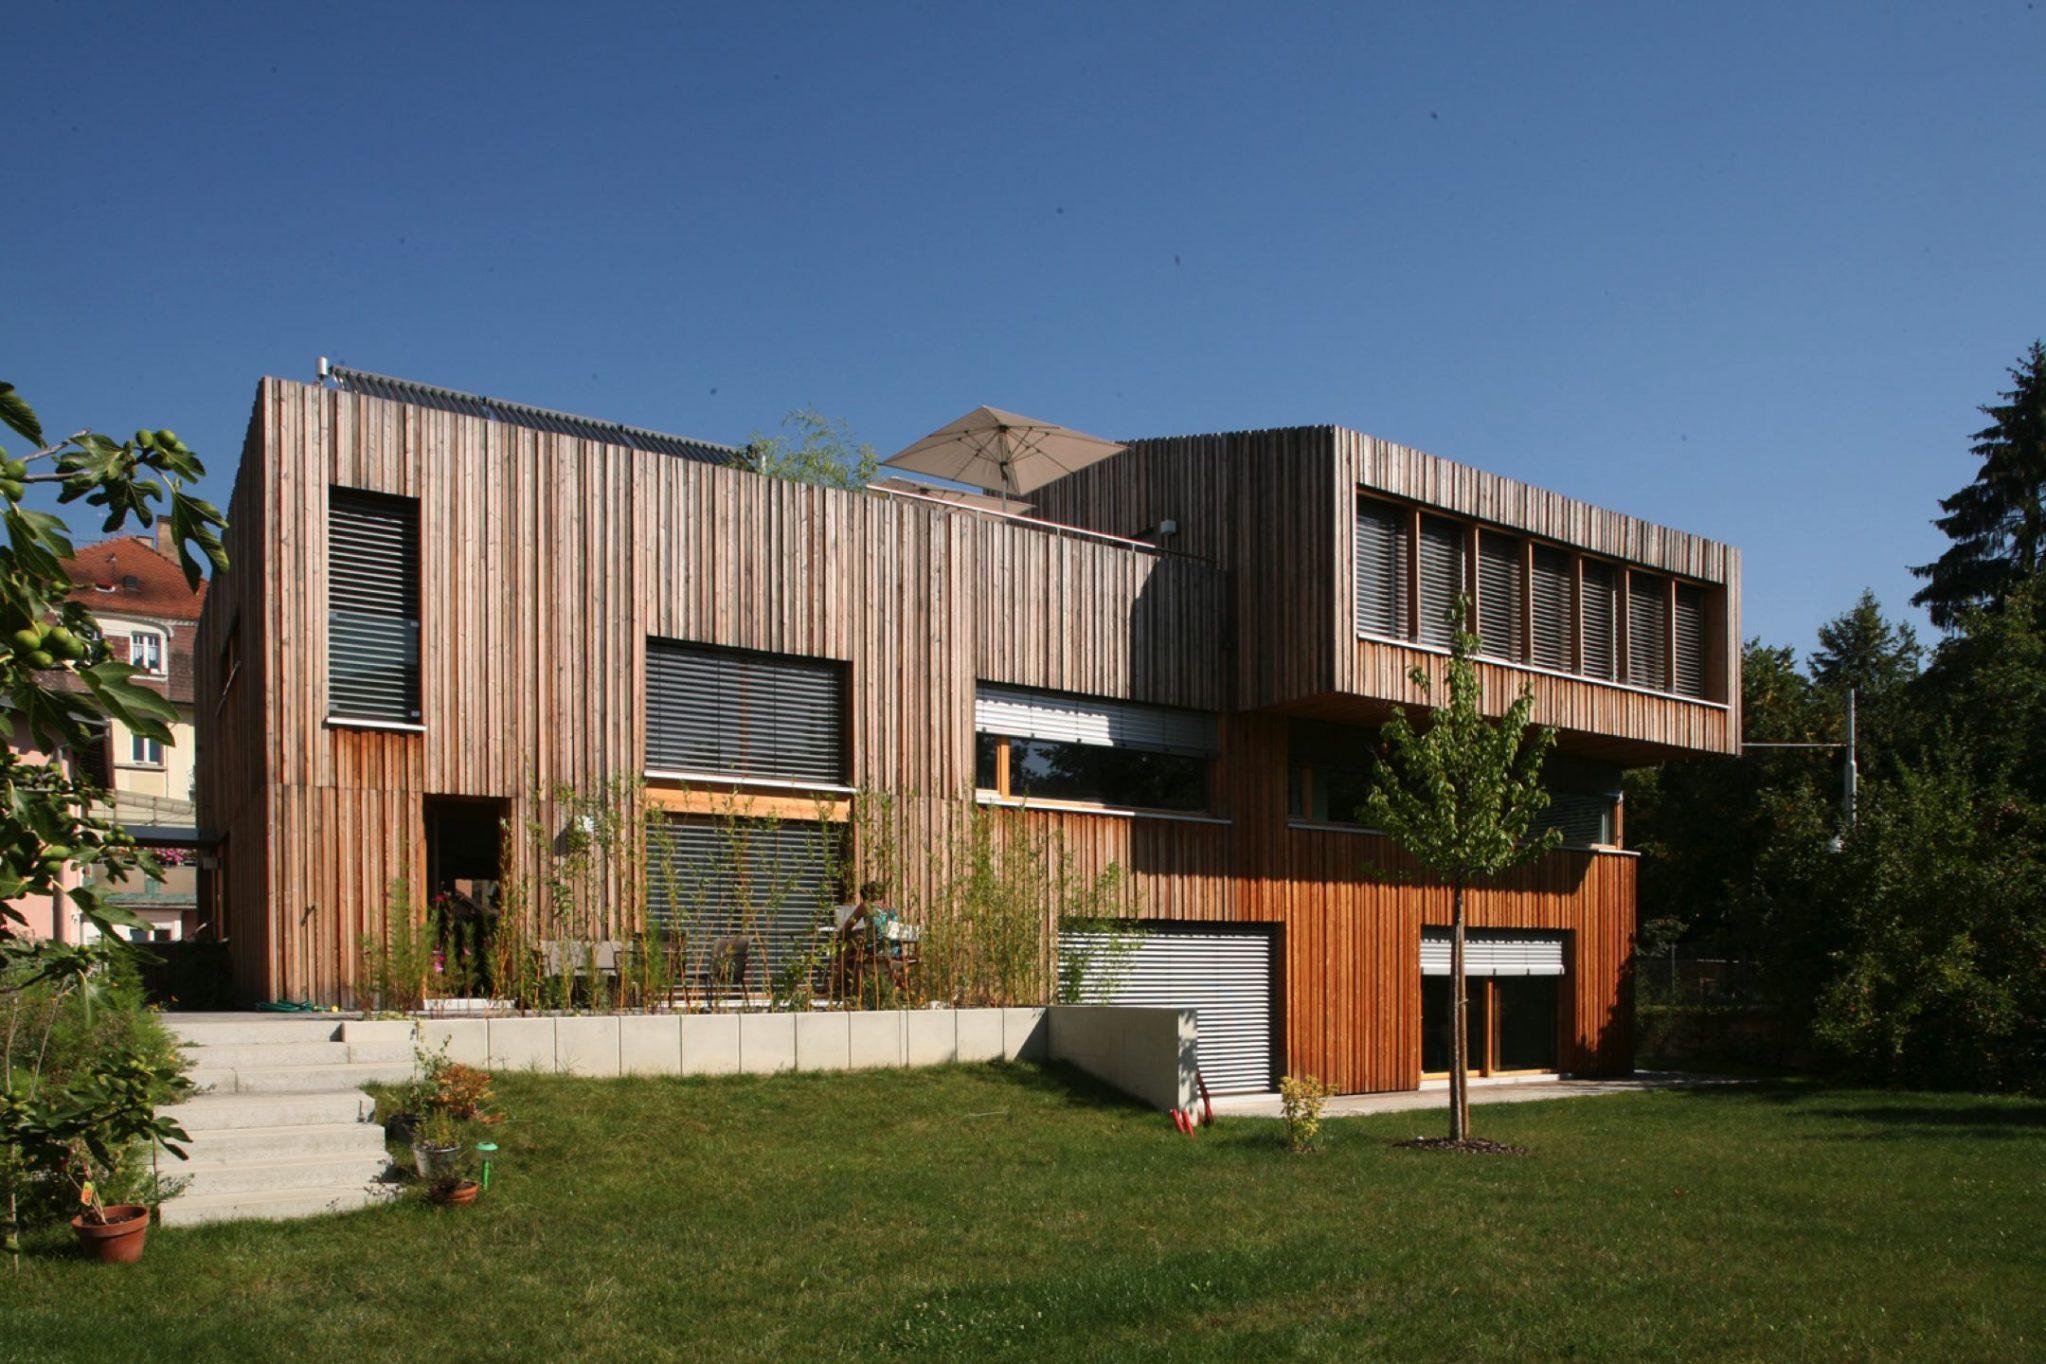 2011 • projet du schluthfeld • strasbourg-neudorf [67]